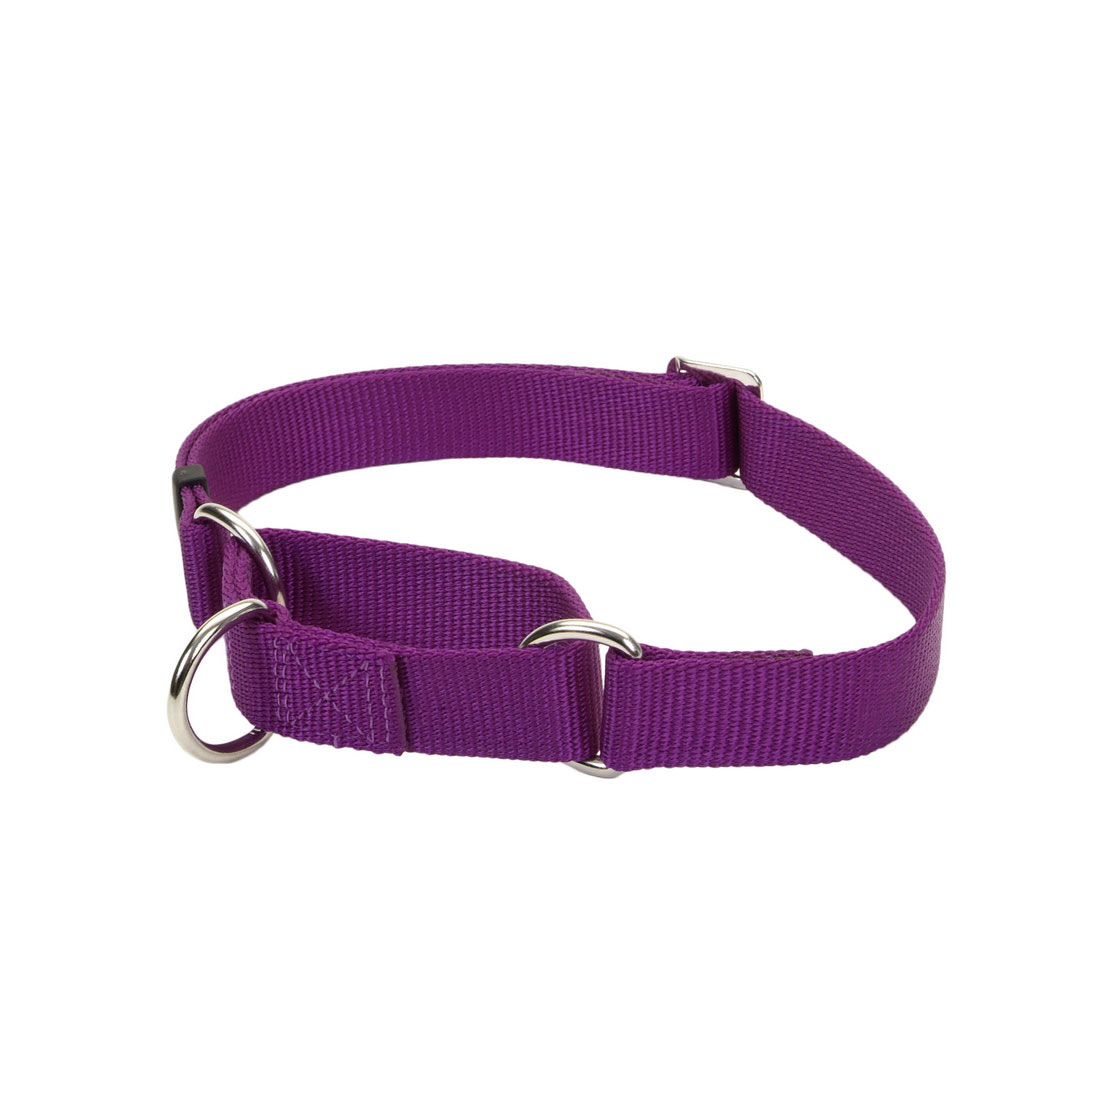 No Slip Martingale Adjustable Dog Collar, Purple Image